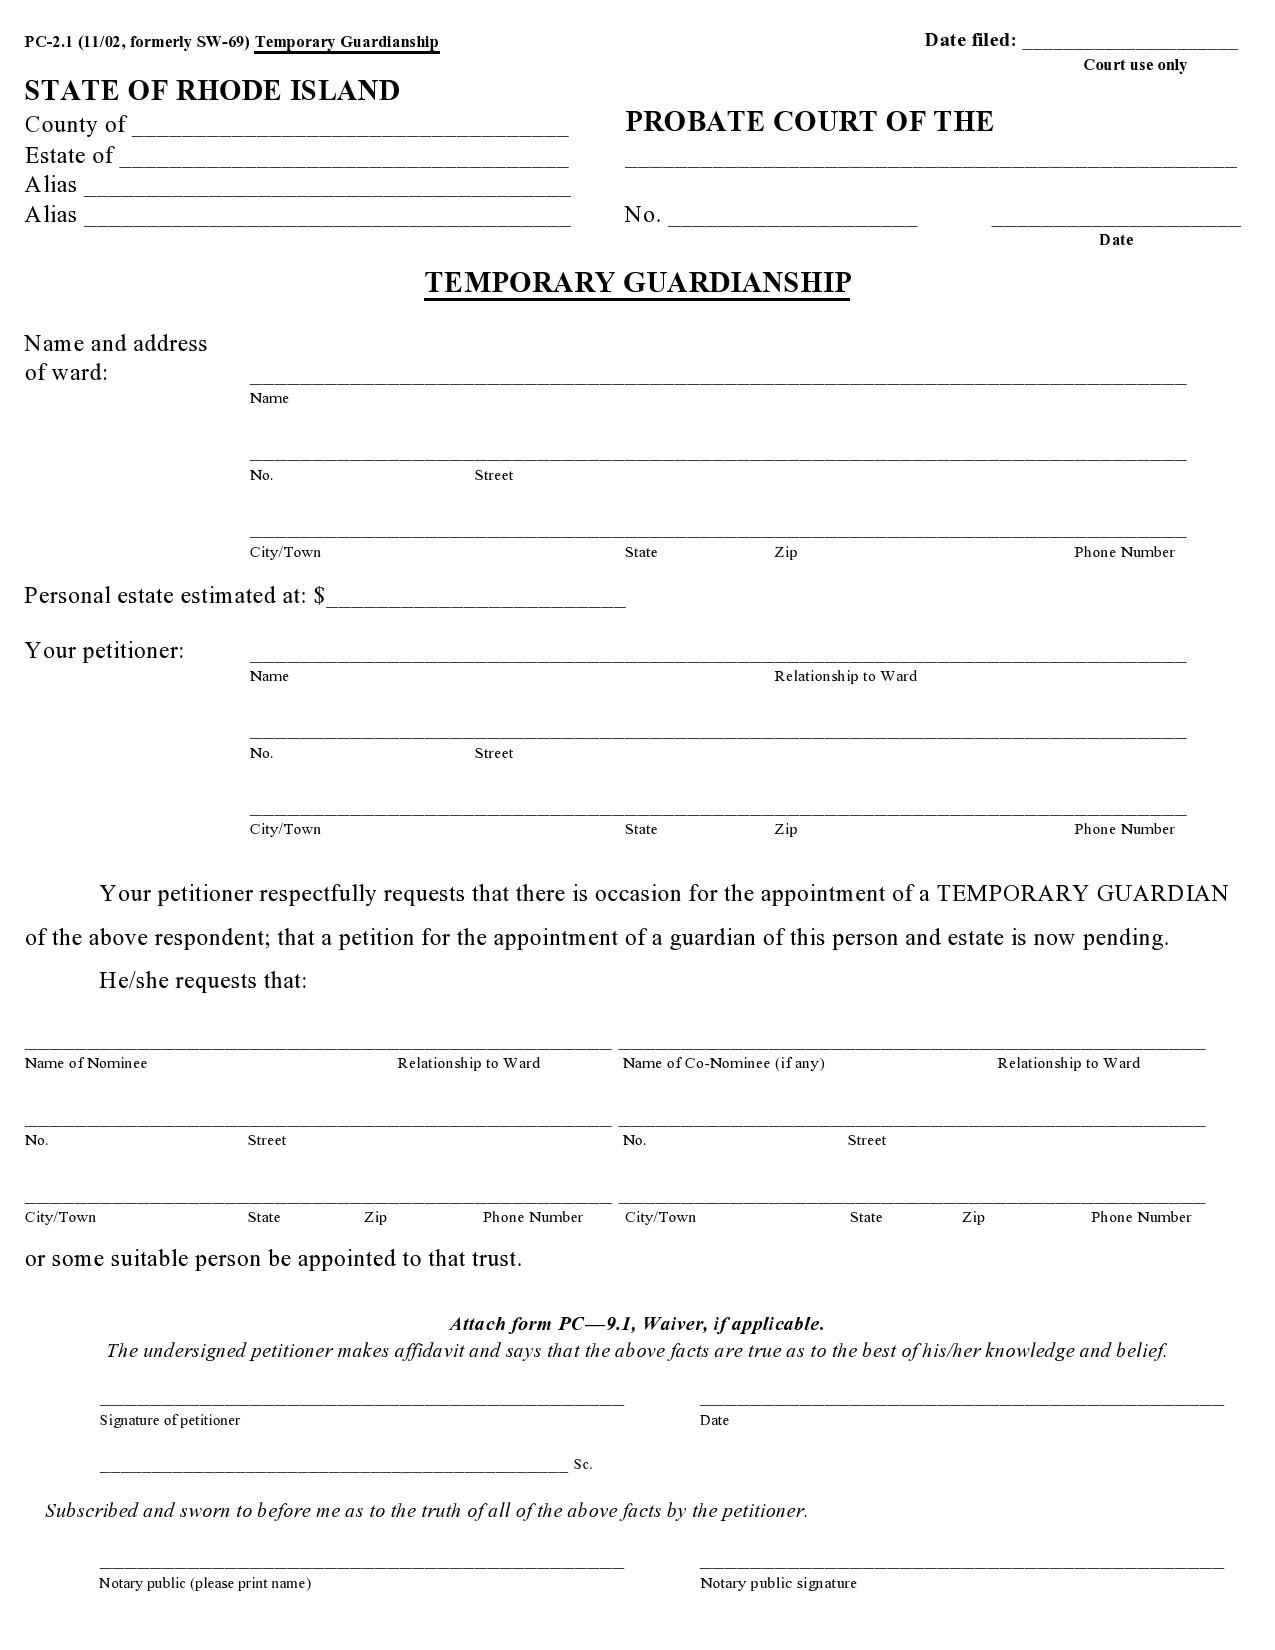 Free guardianship form 10